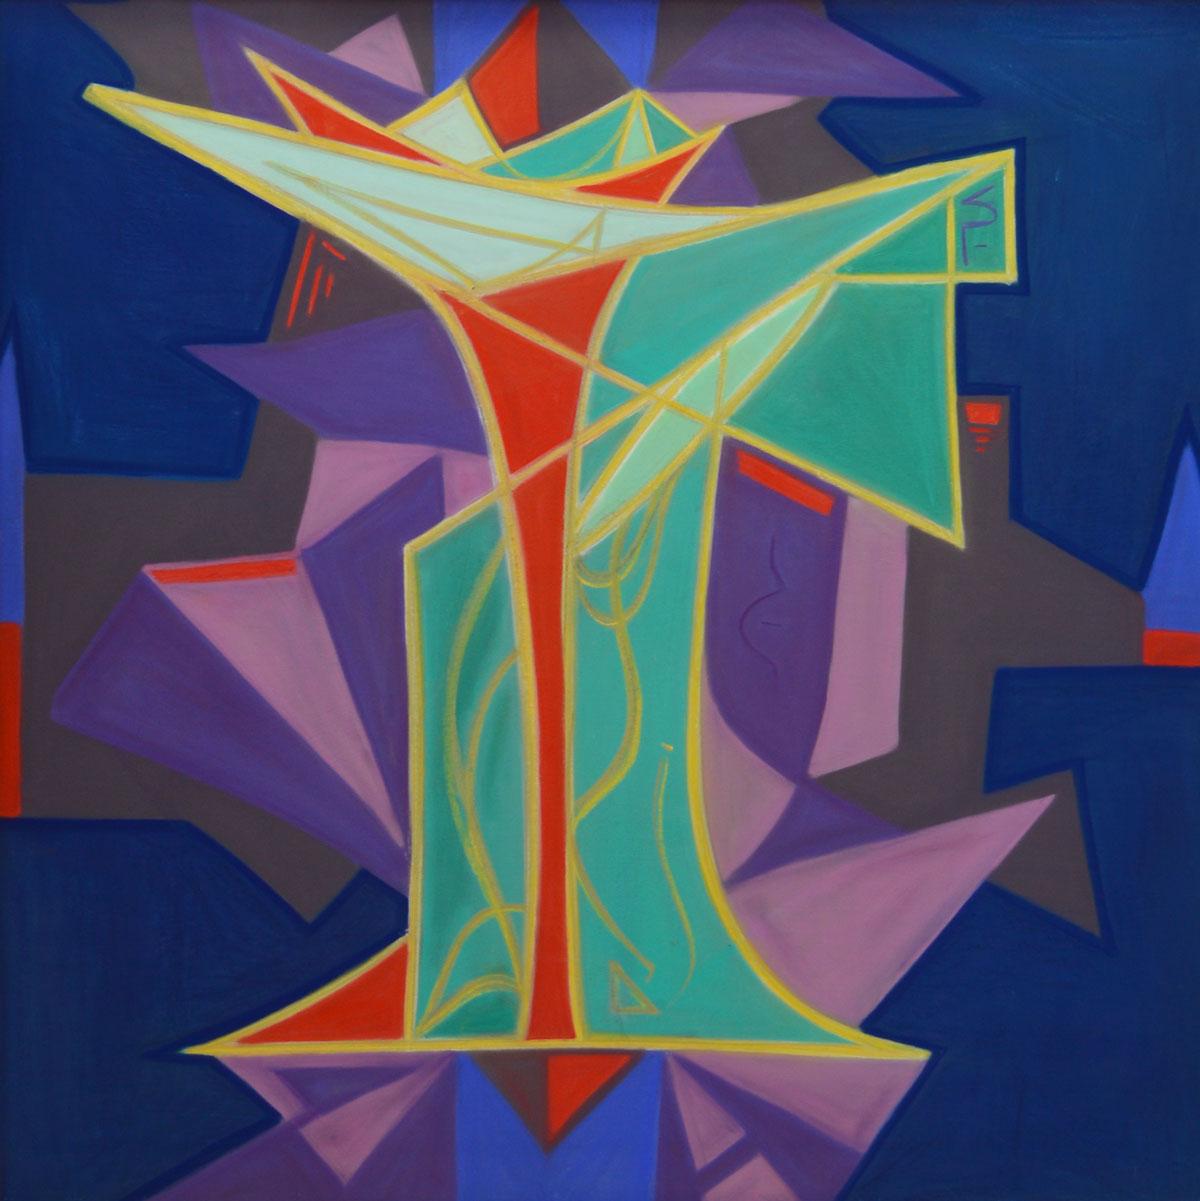 Estrella de Amilcar by Ian James Roche